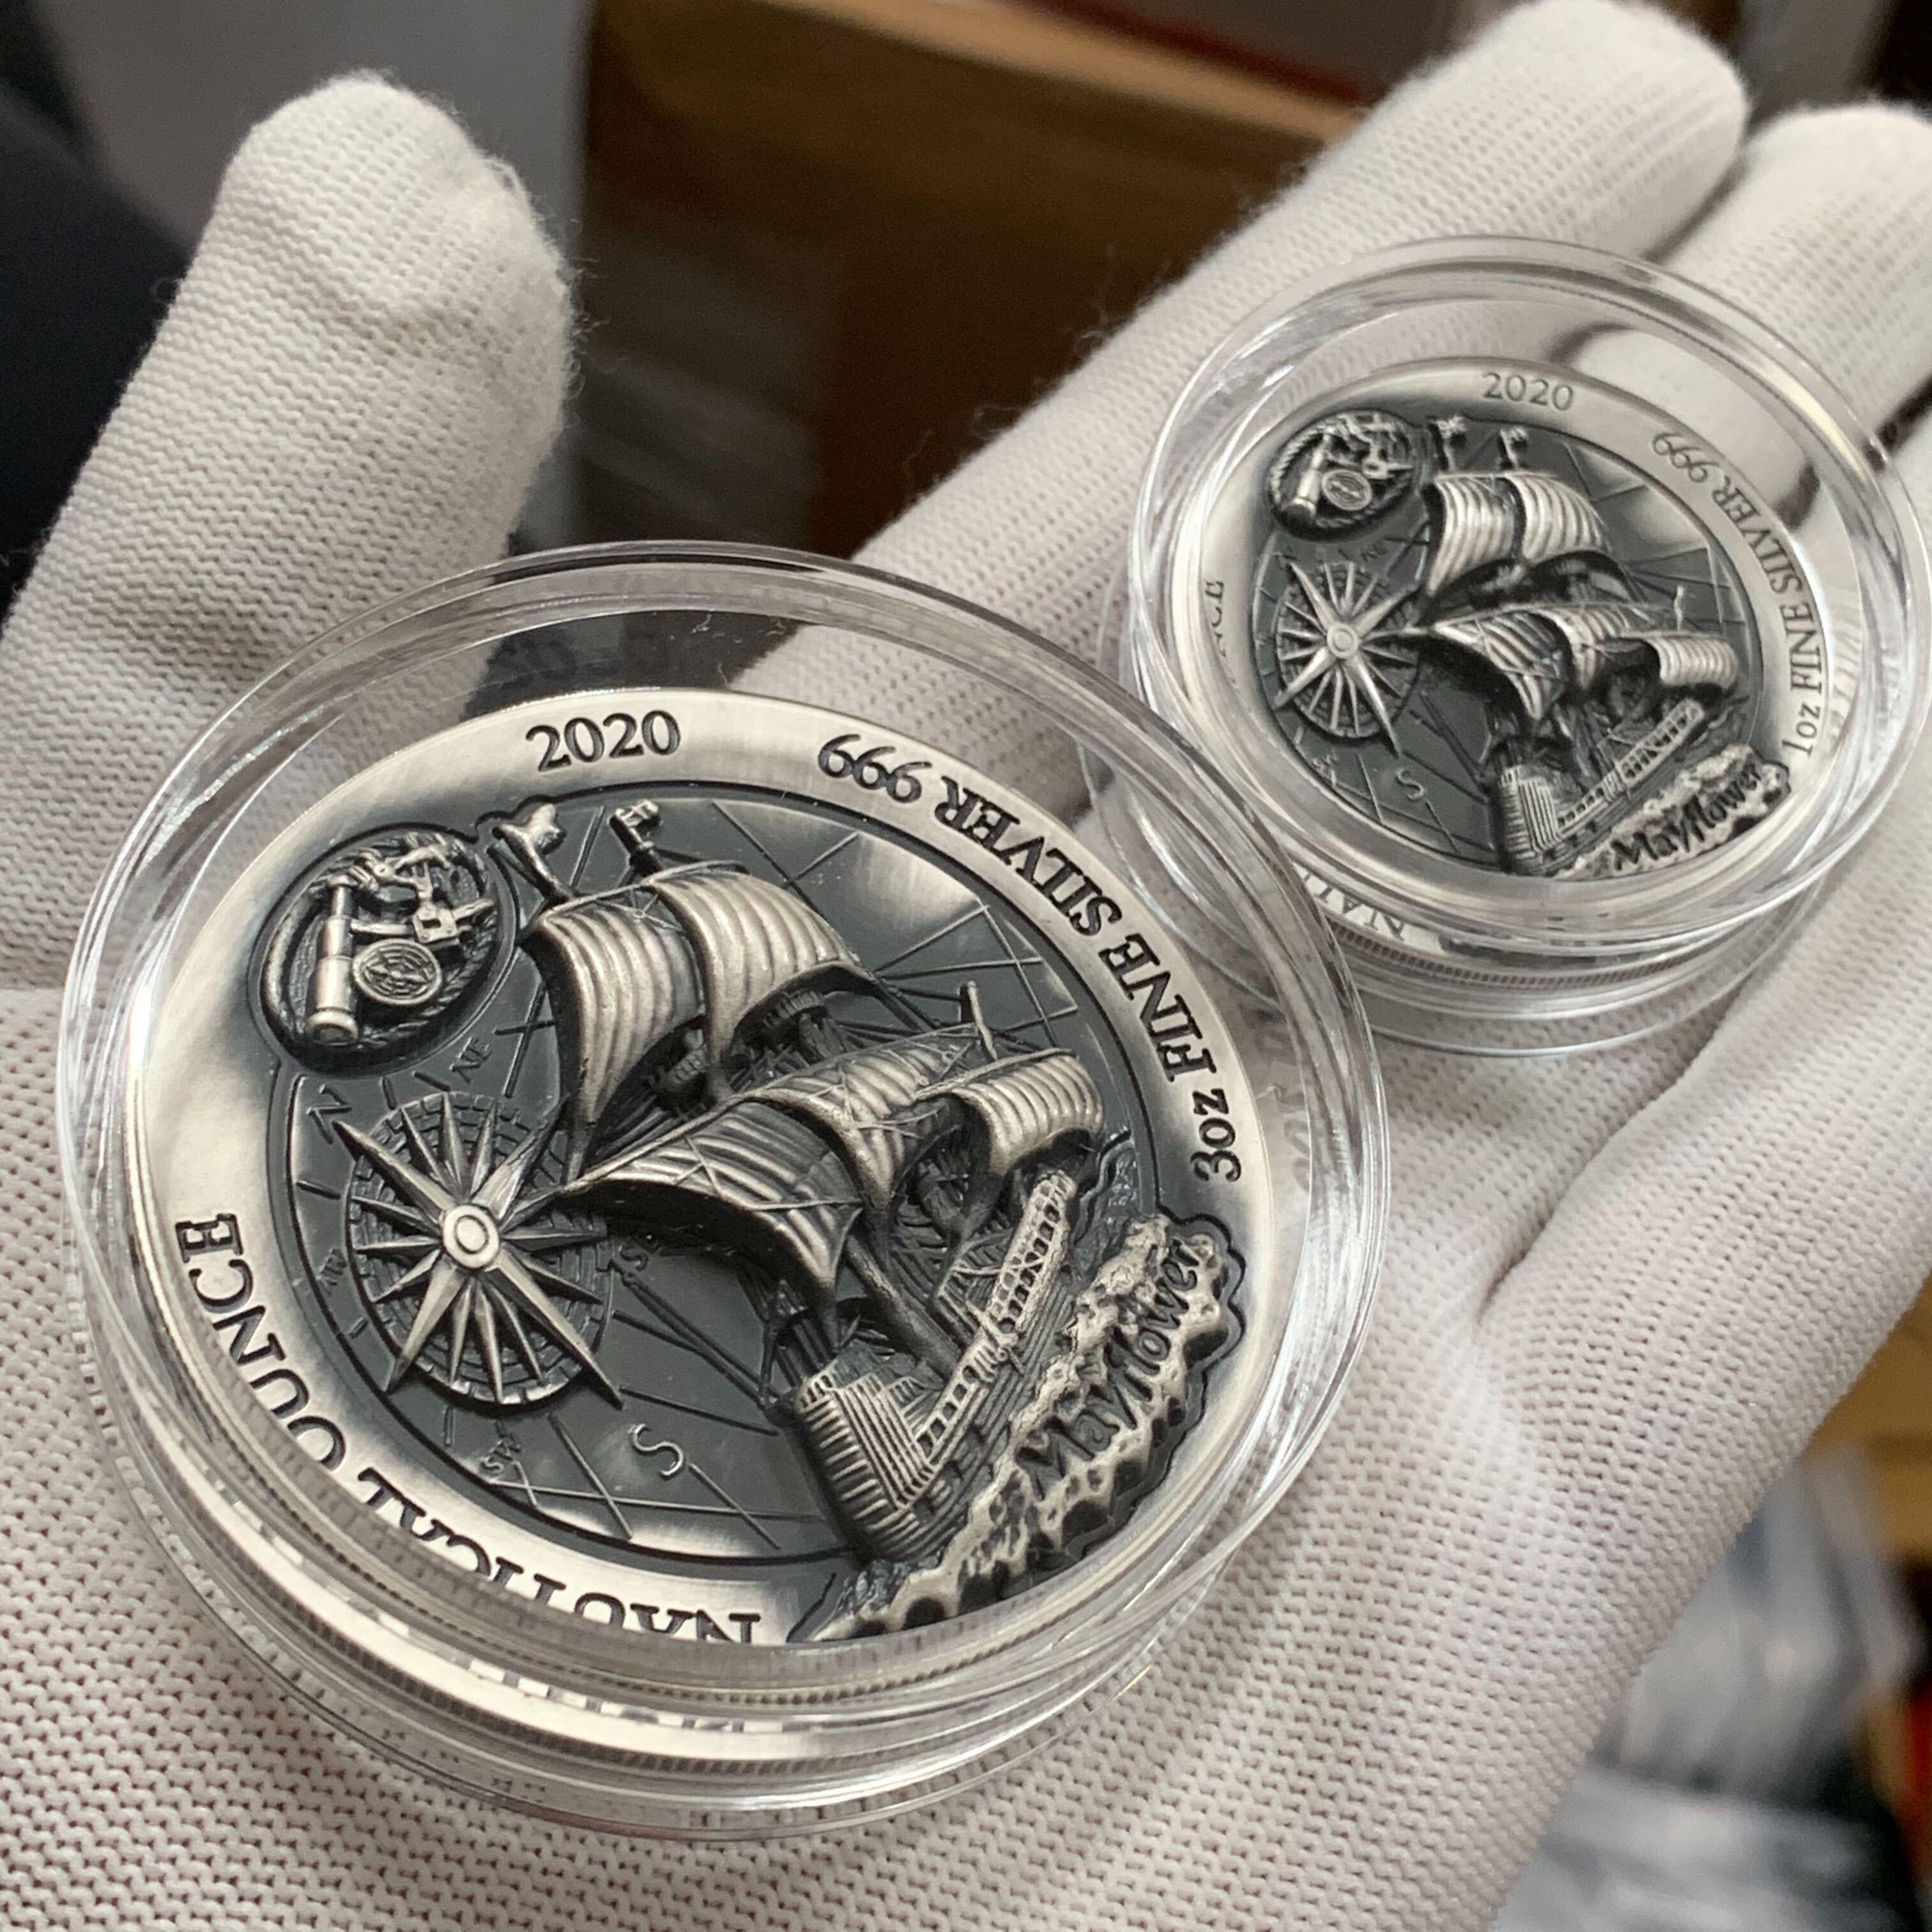 2020 1 Oz 3 Oz Rwanda Nautical Ounce Mayflower 999 Silver High Relief Antique Coins In 2020 Silver Coins Antique Coins Silver Bullion